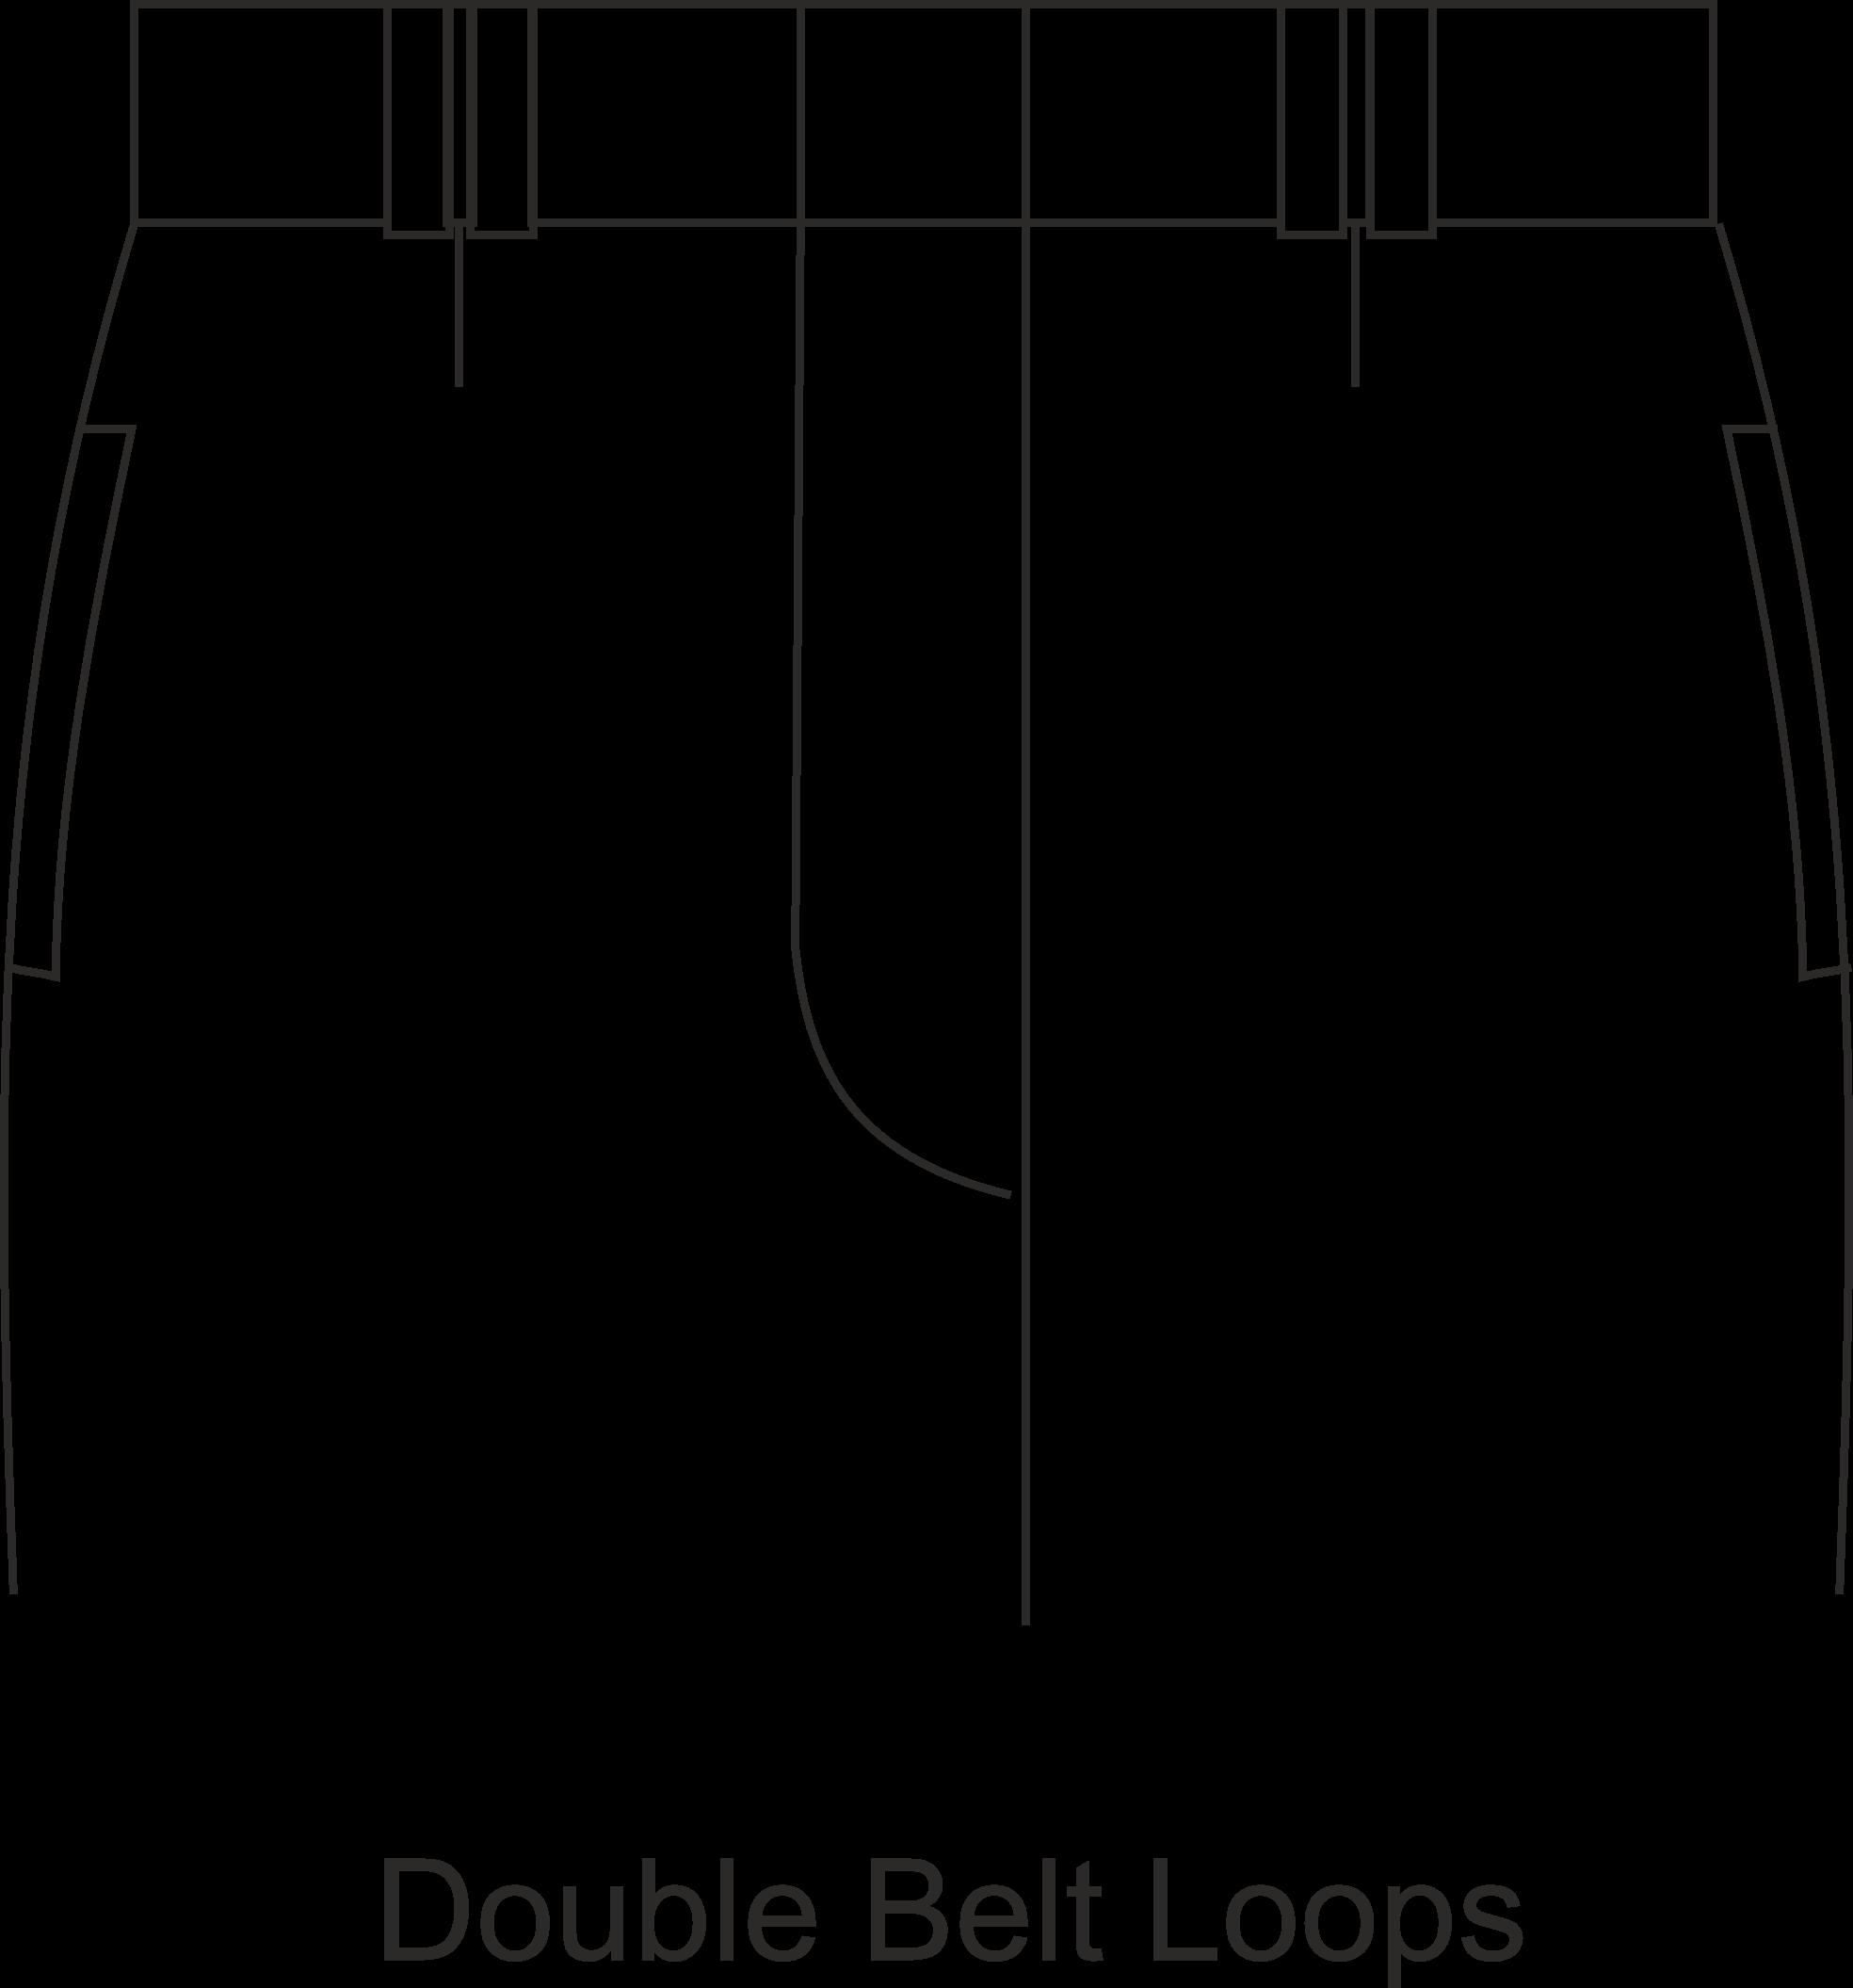 buckles-double-belt-loops